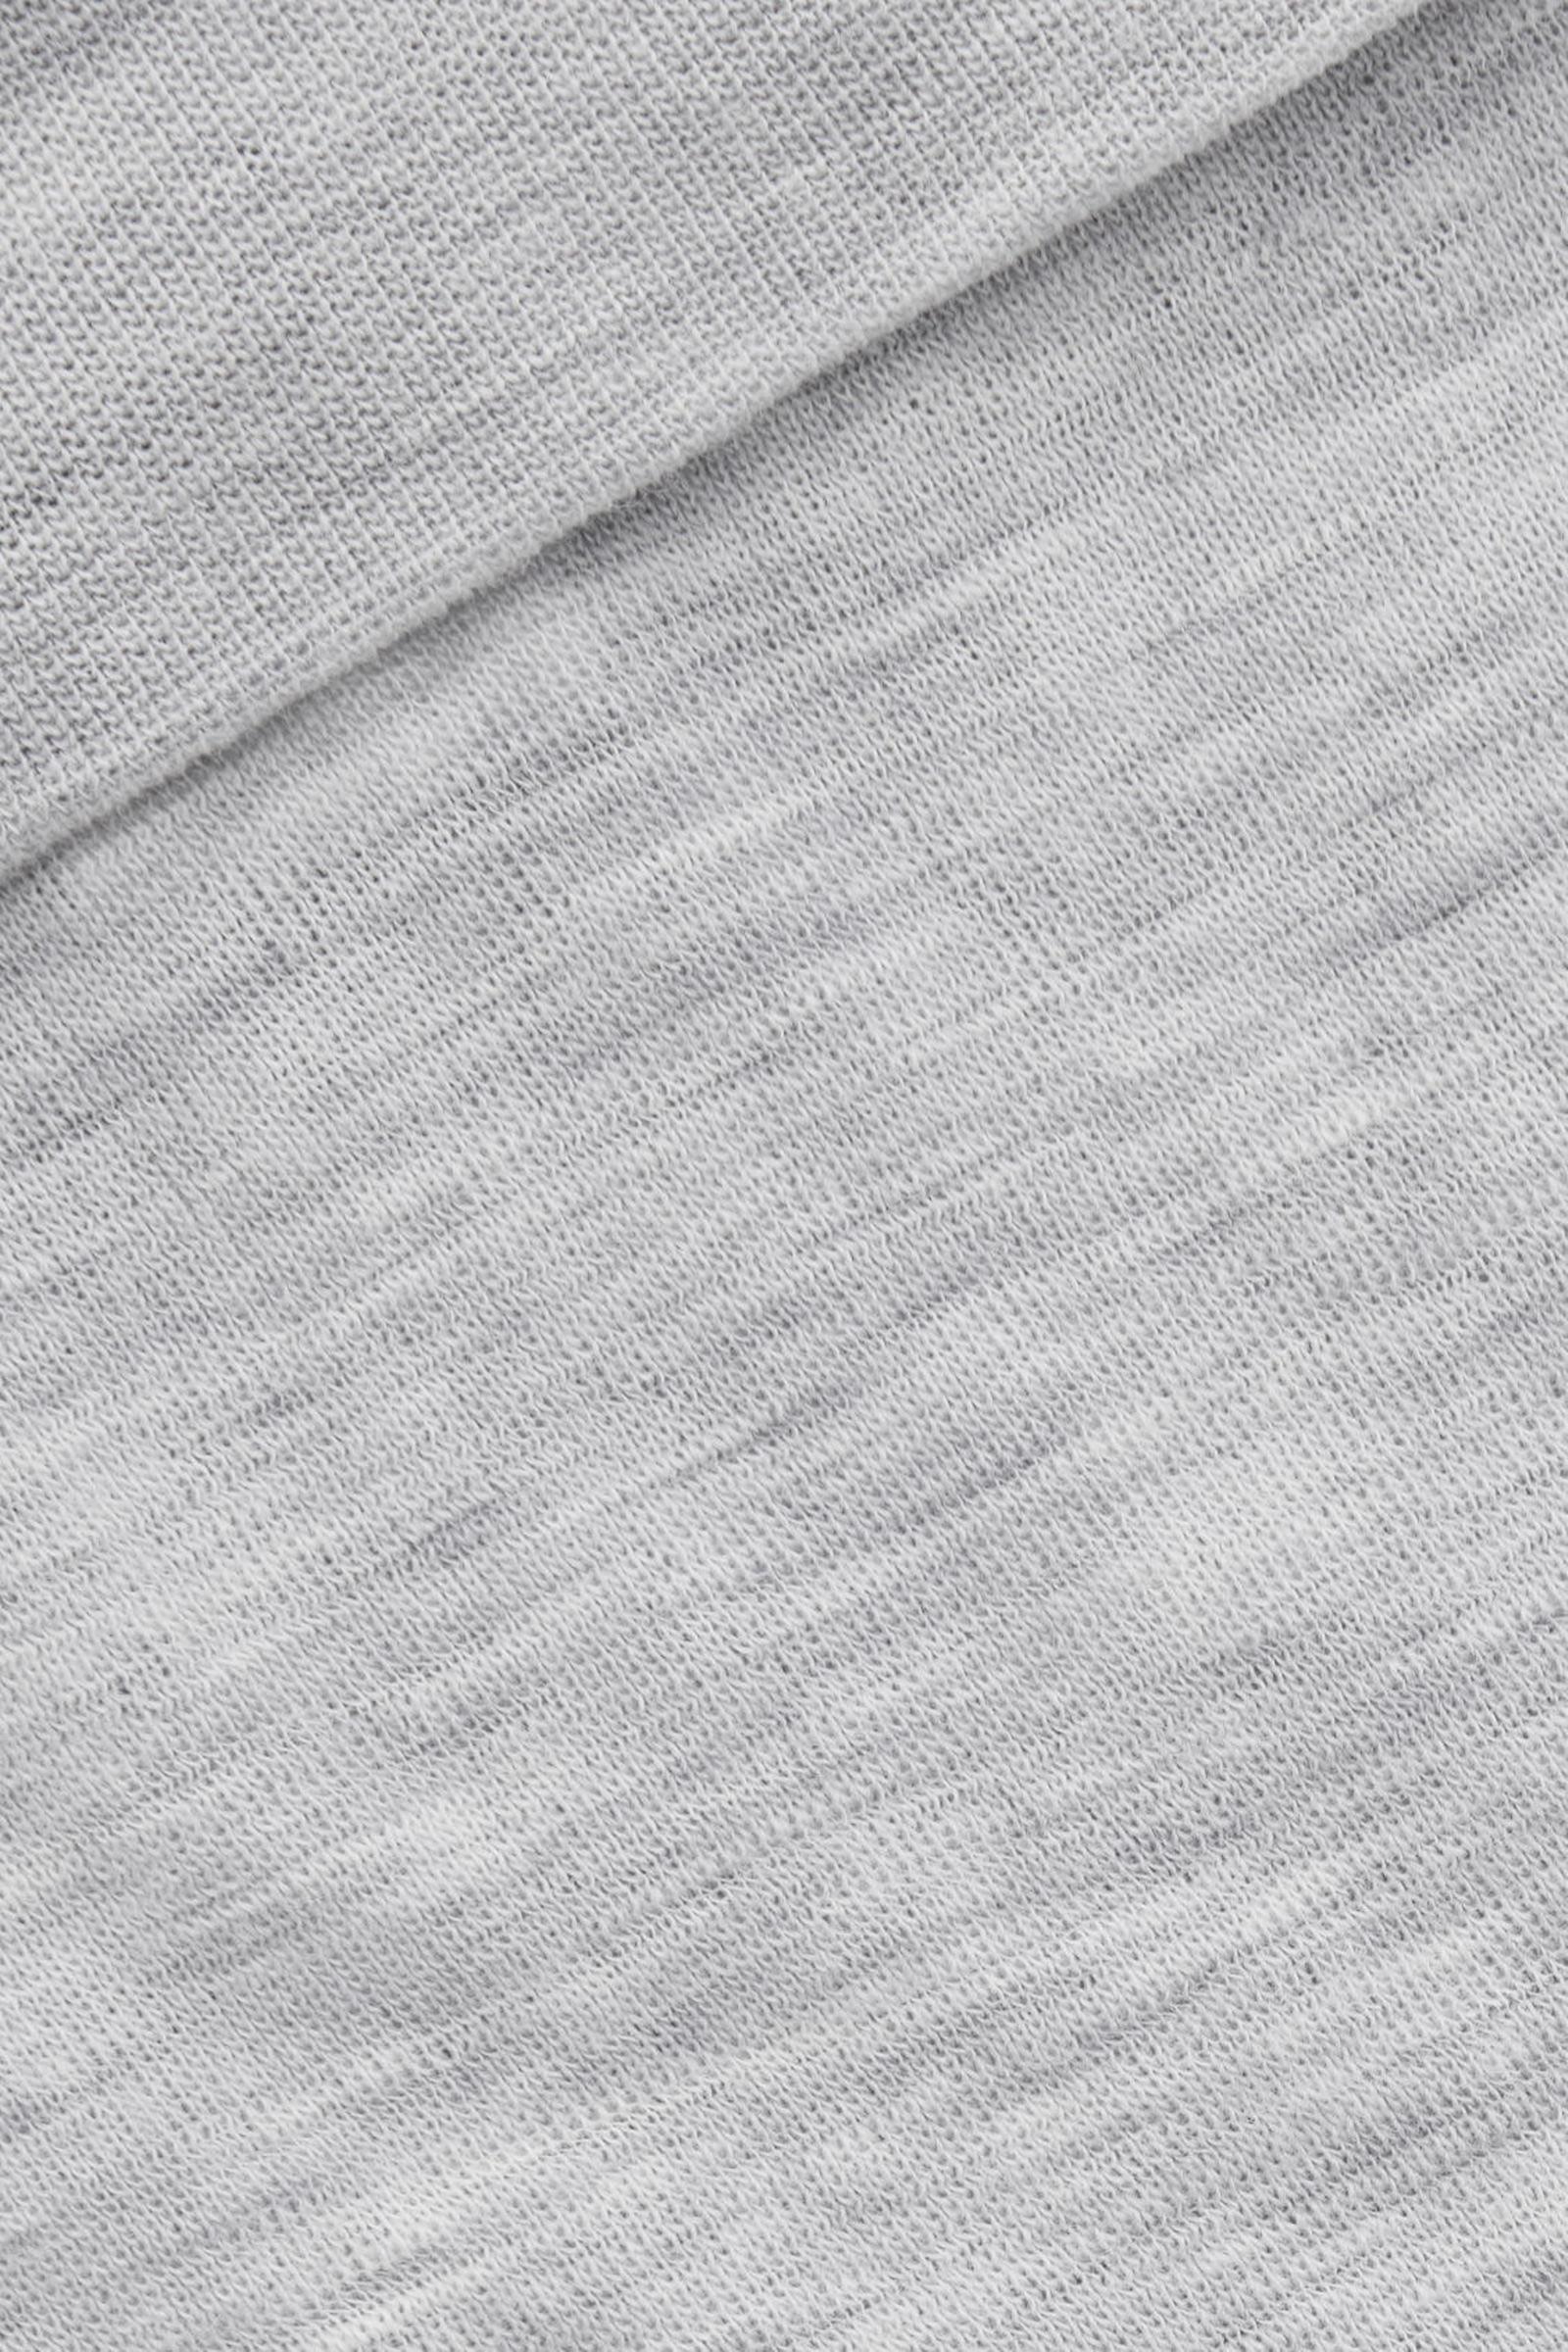 COS 라이트웨이트 울 레깅스의 그레이컬러 Detail입니다.